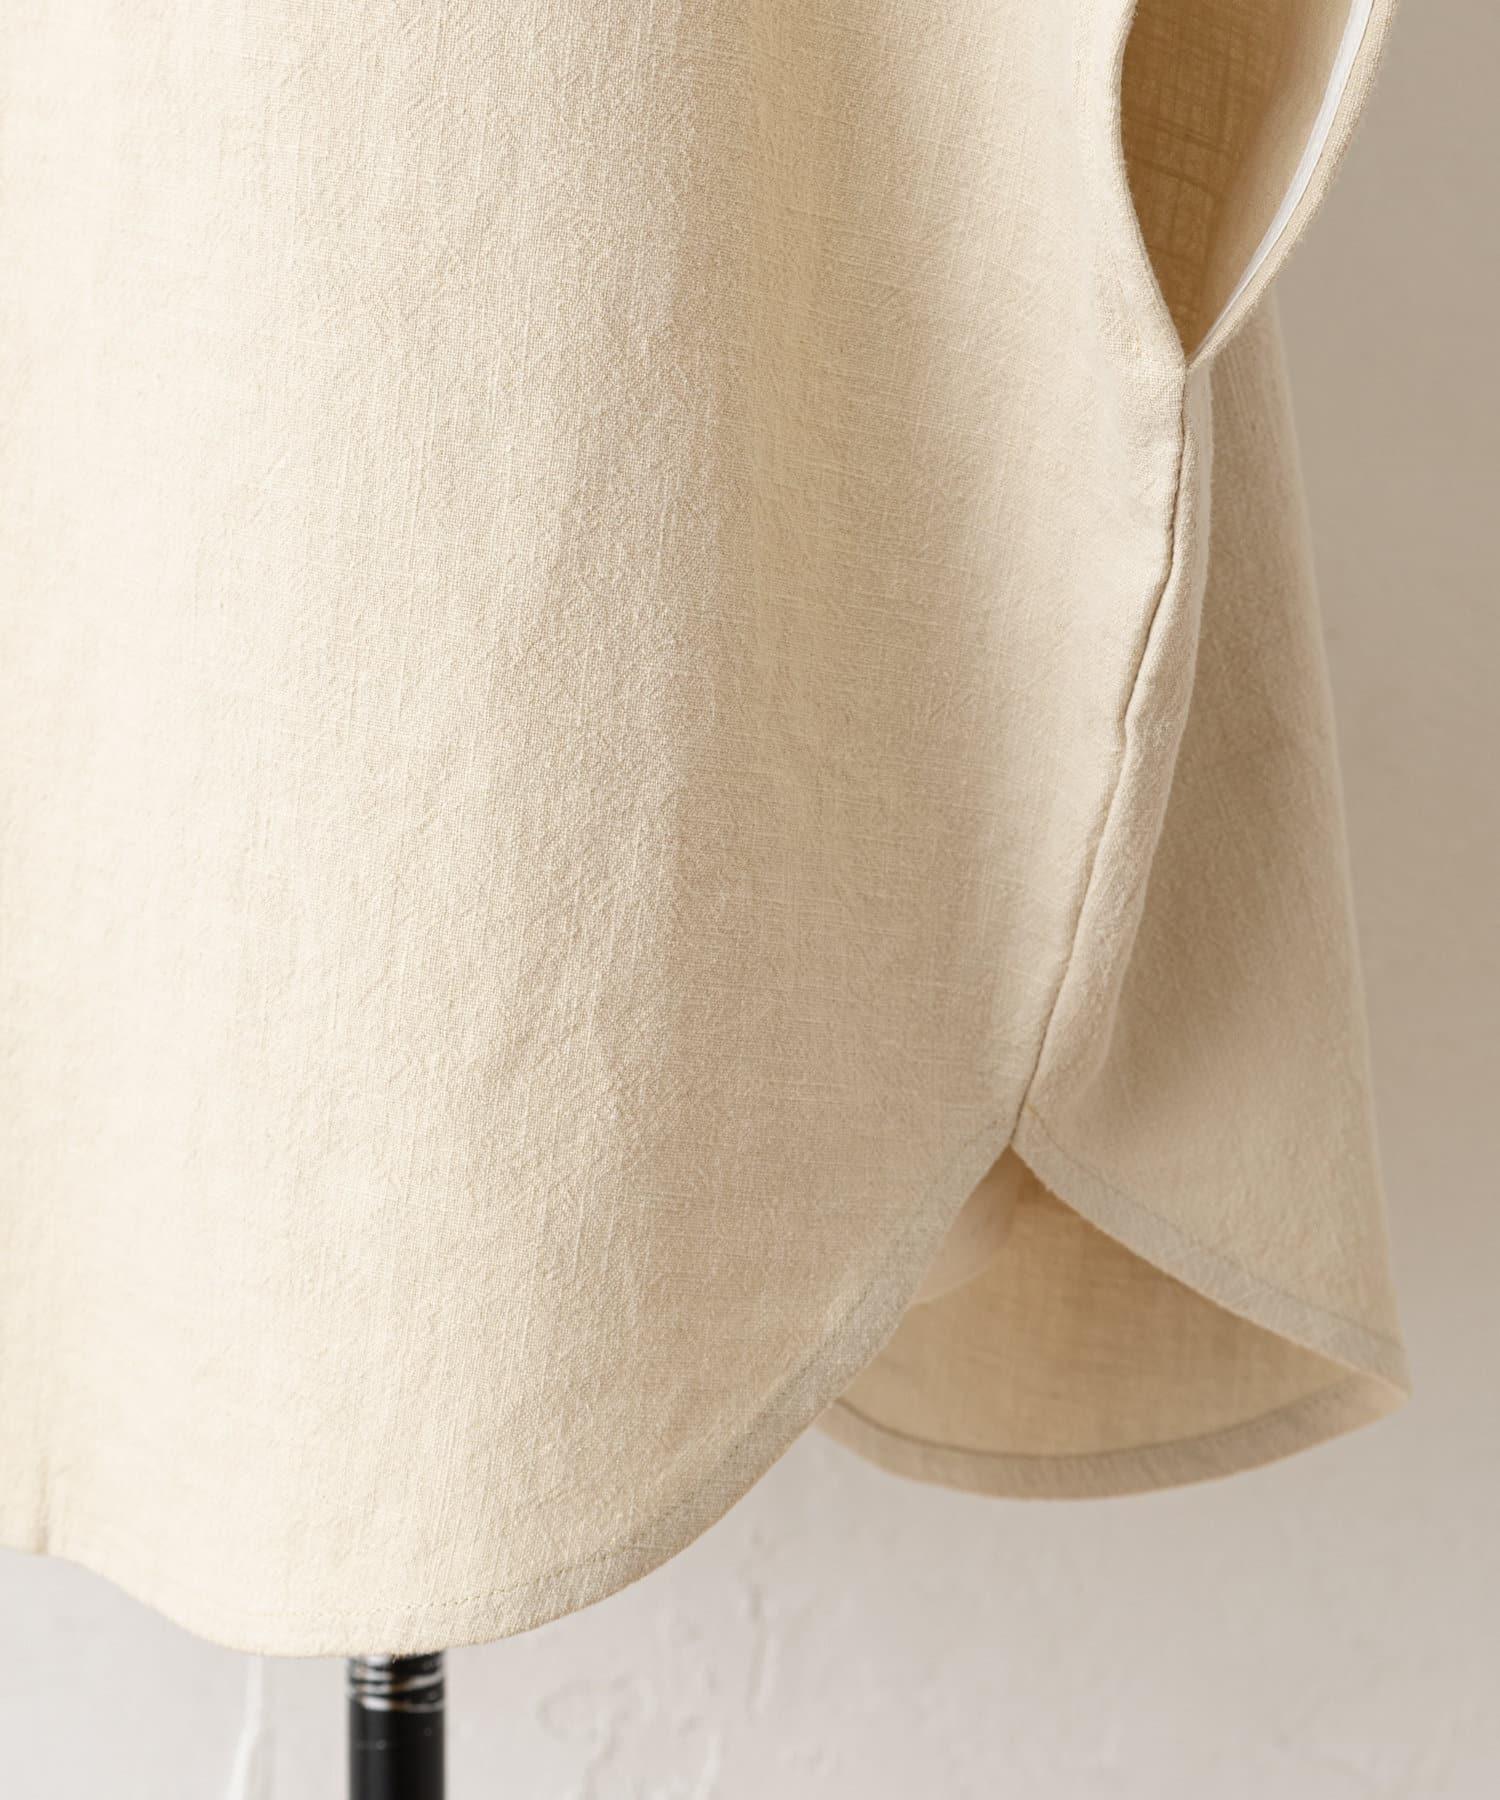 BEARDSLEY(ビアズリー) 《予約・WEB限定で復活》ウシロ花刺繍マルブラウス